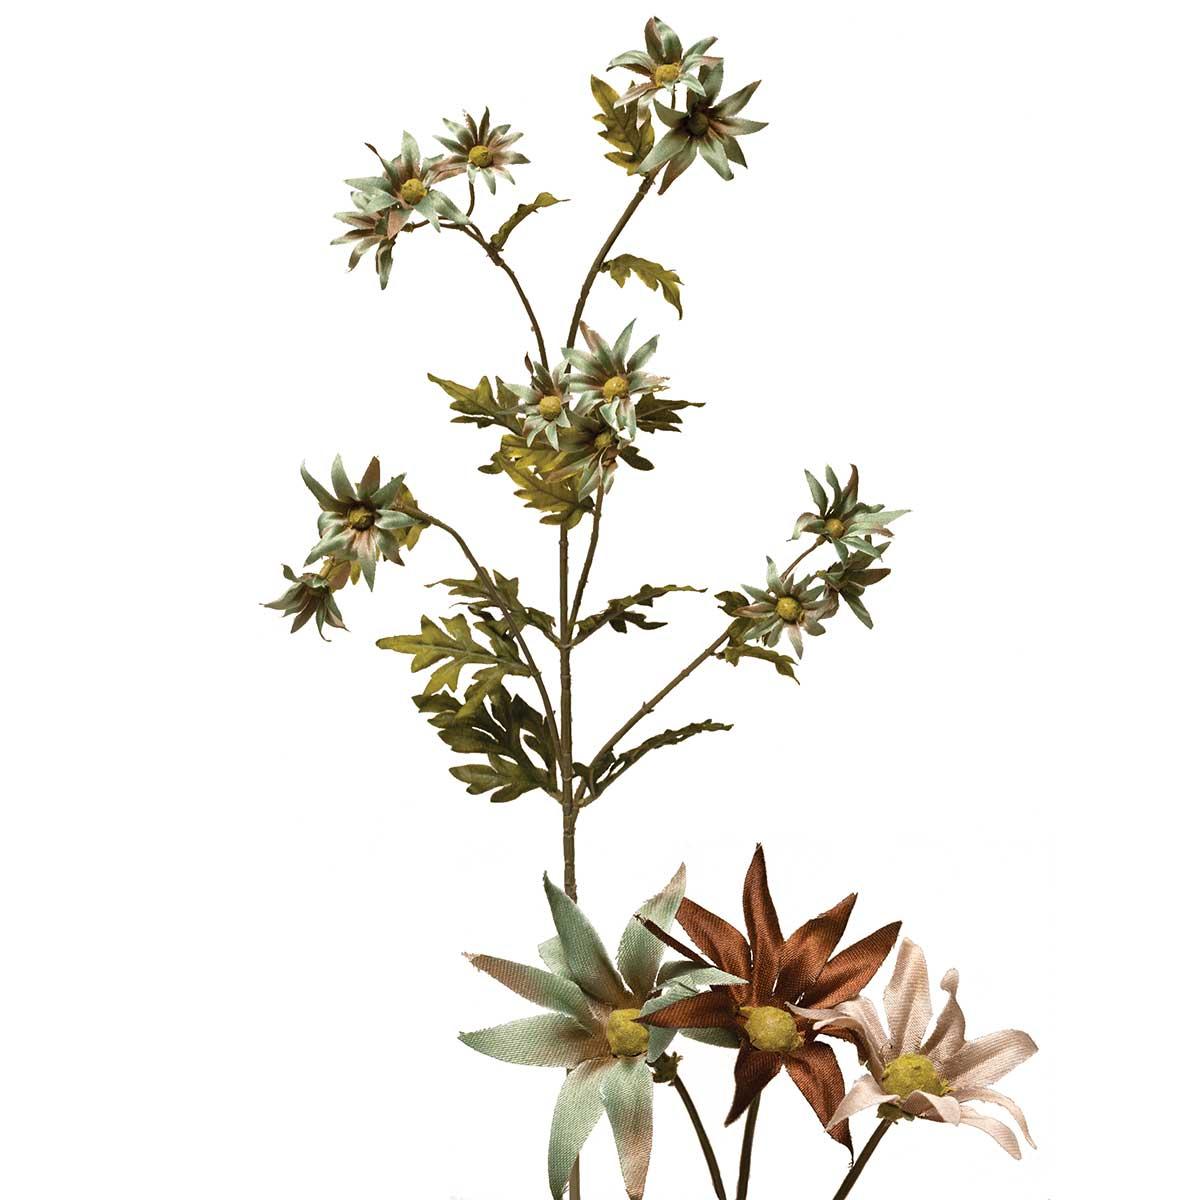 BELLA STAR FLOWER ASSORTMENT PACK 18 UNITS APM8763 *50b